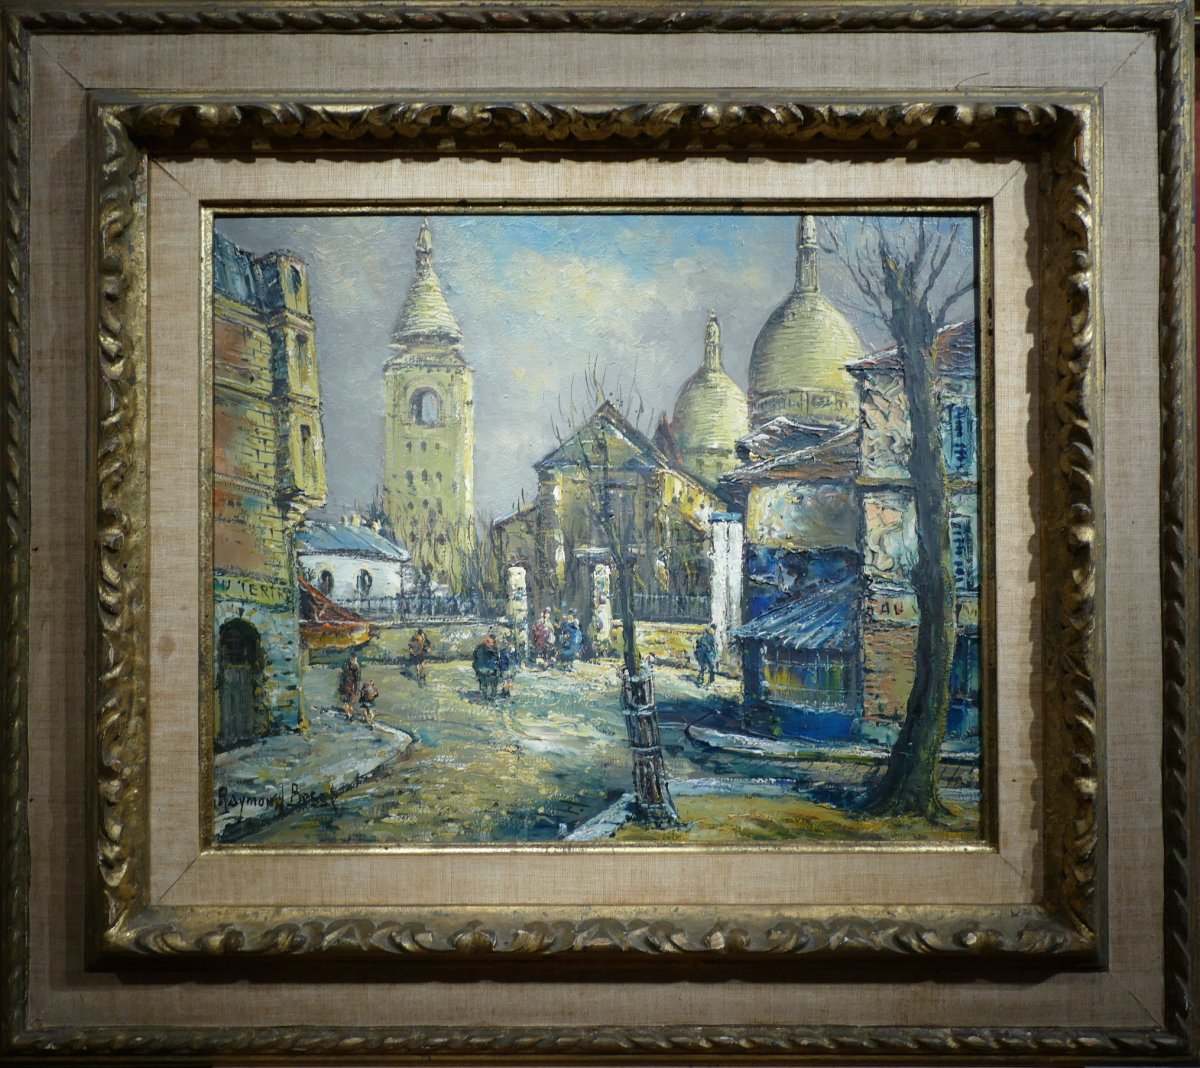 Besse Raymond French Painting 20th Paris Montmartre La Place Du Tertre Oil On Canvas Signed